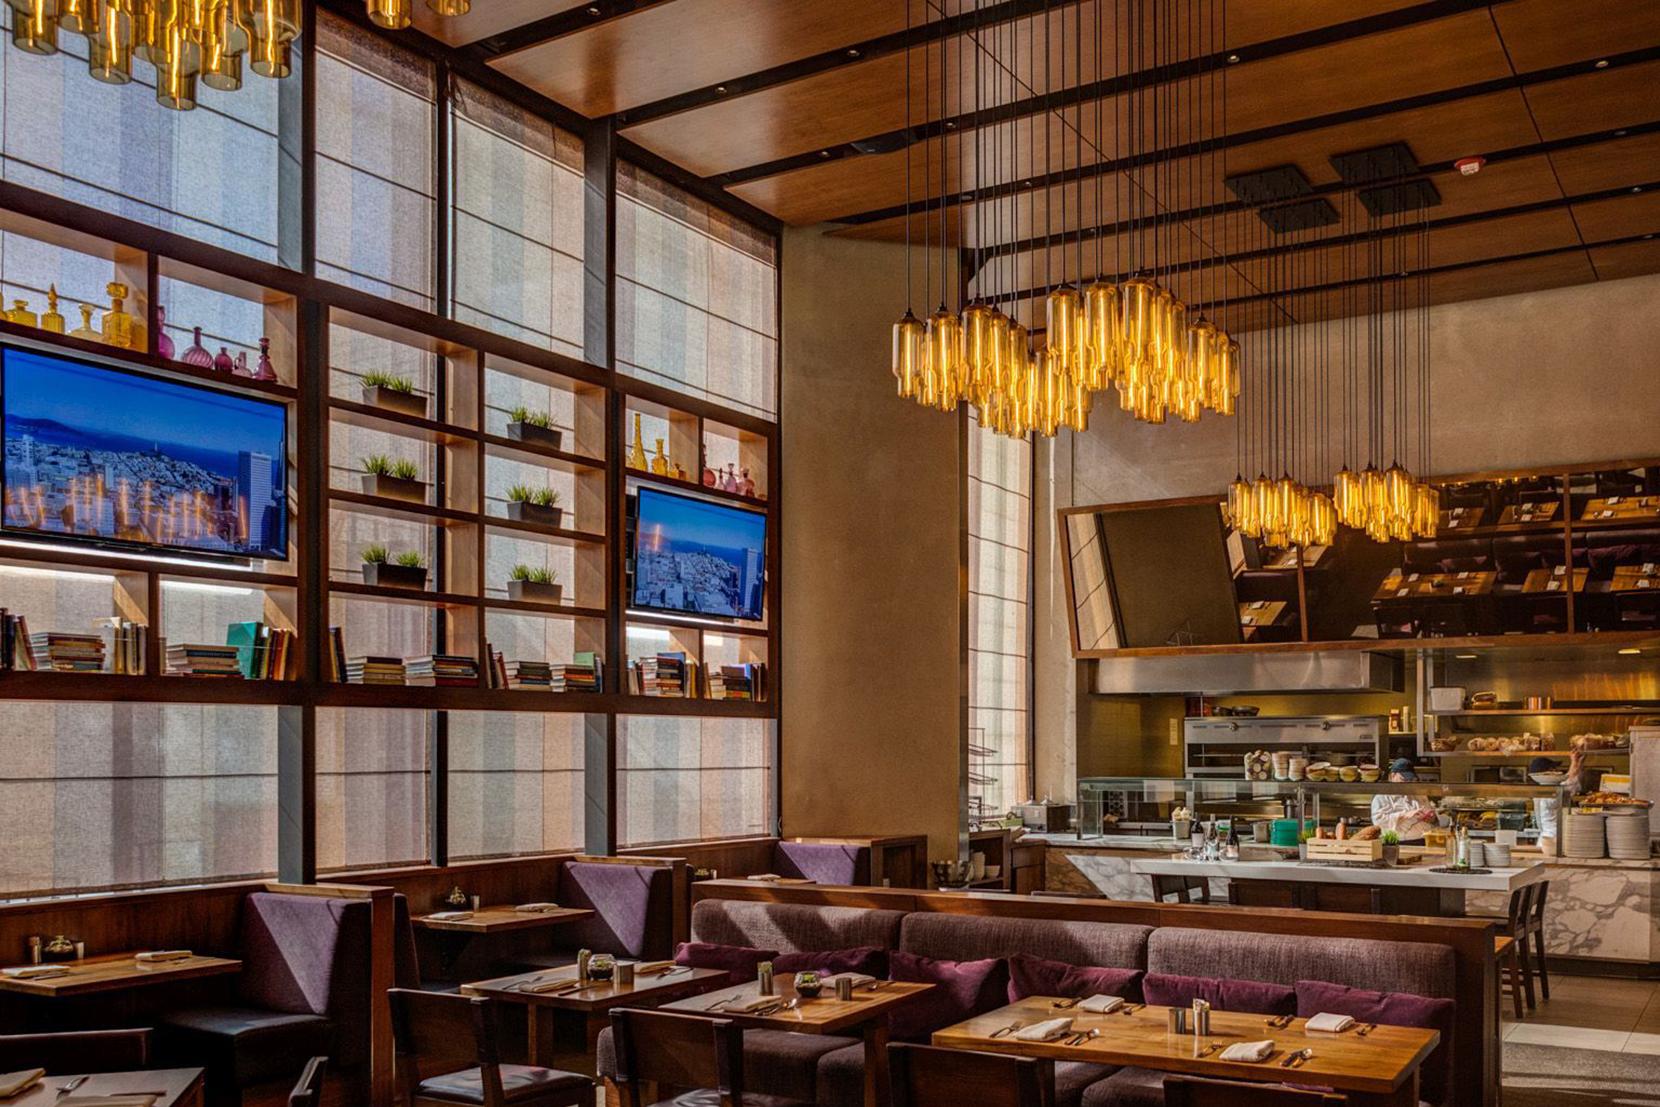 Modern-Restaurant-Lighting-San-Fran-Hyatt-Hotel.png